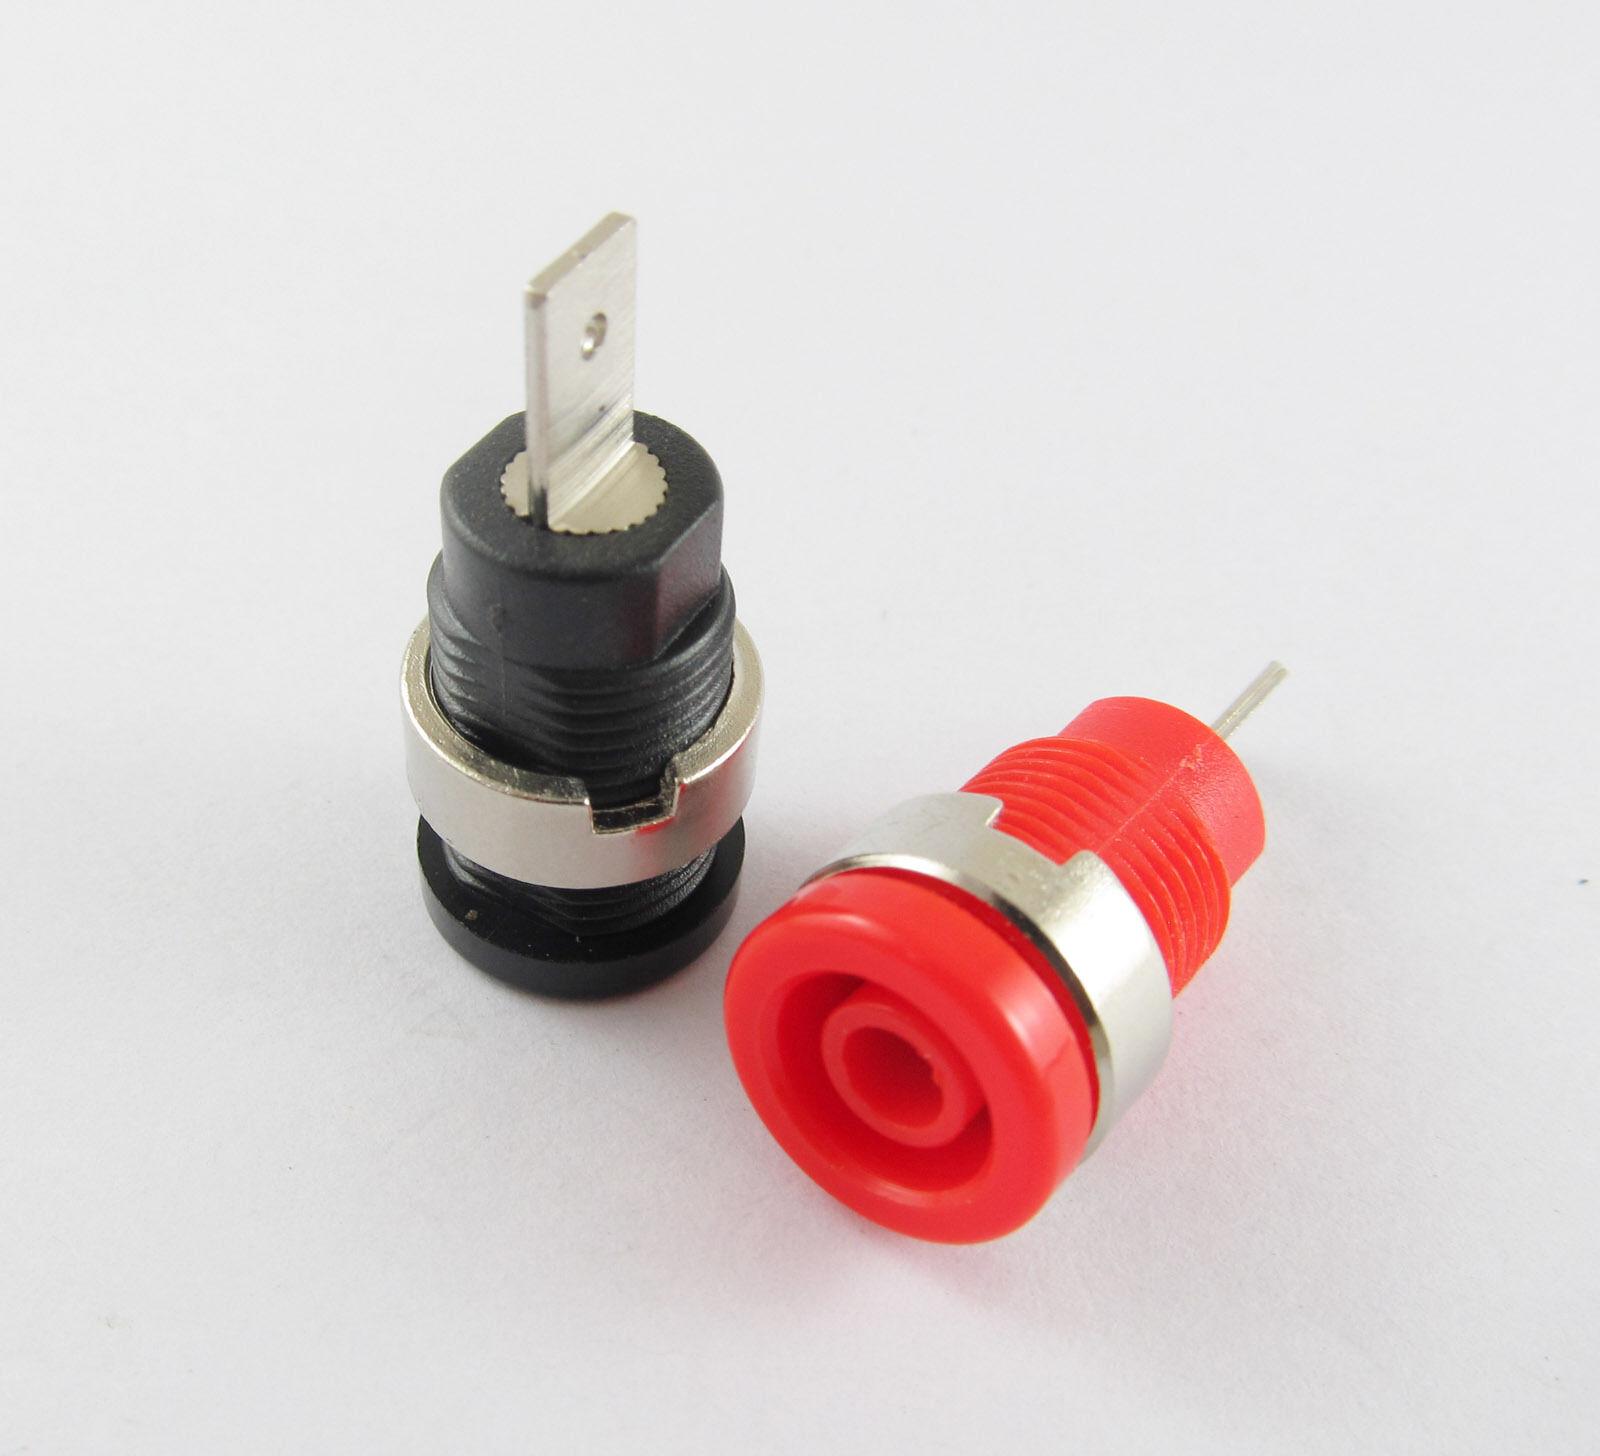 10x Red Multimeter Instrument 2mm Binding Post Banana Panel Mount Test Probe New